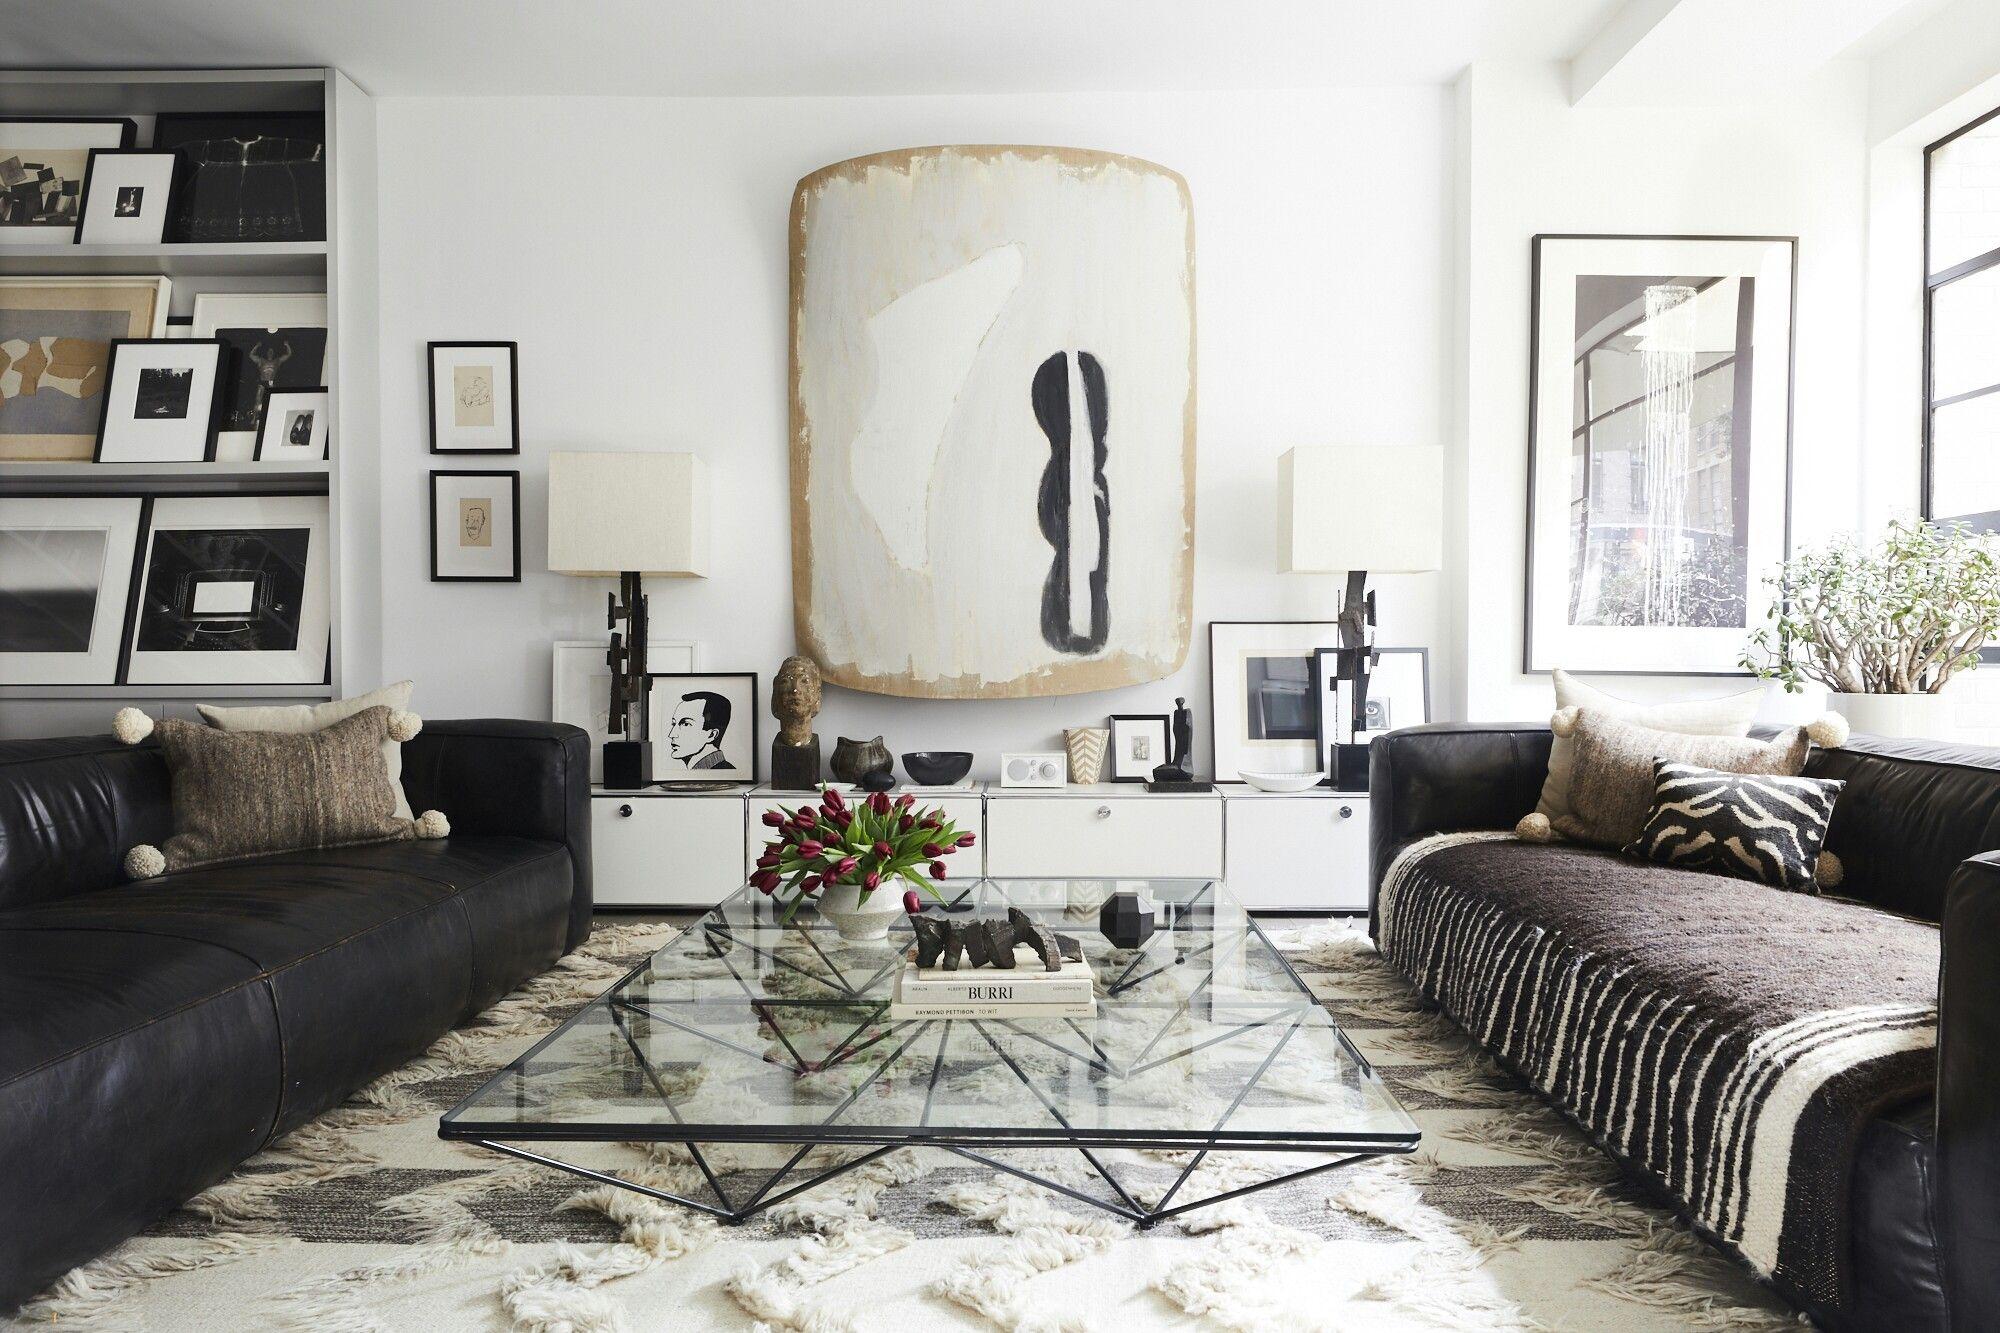 Pin By Theninahbee On Va Va Voom Vignettes Living Room Trends Living Room Trends 2019 Living Room Colors